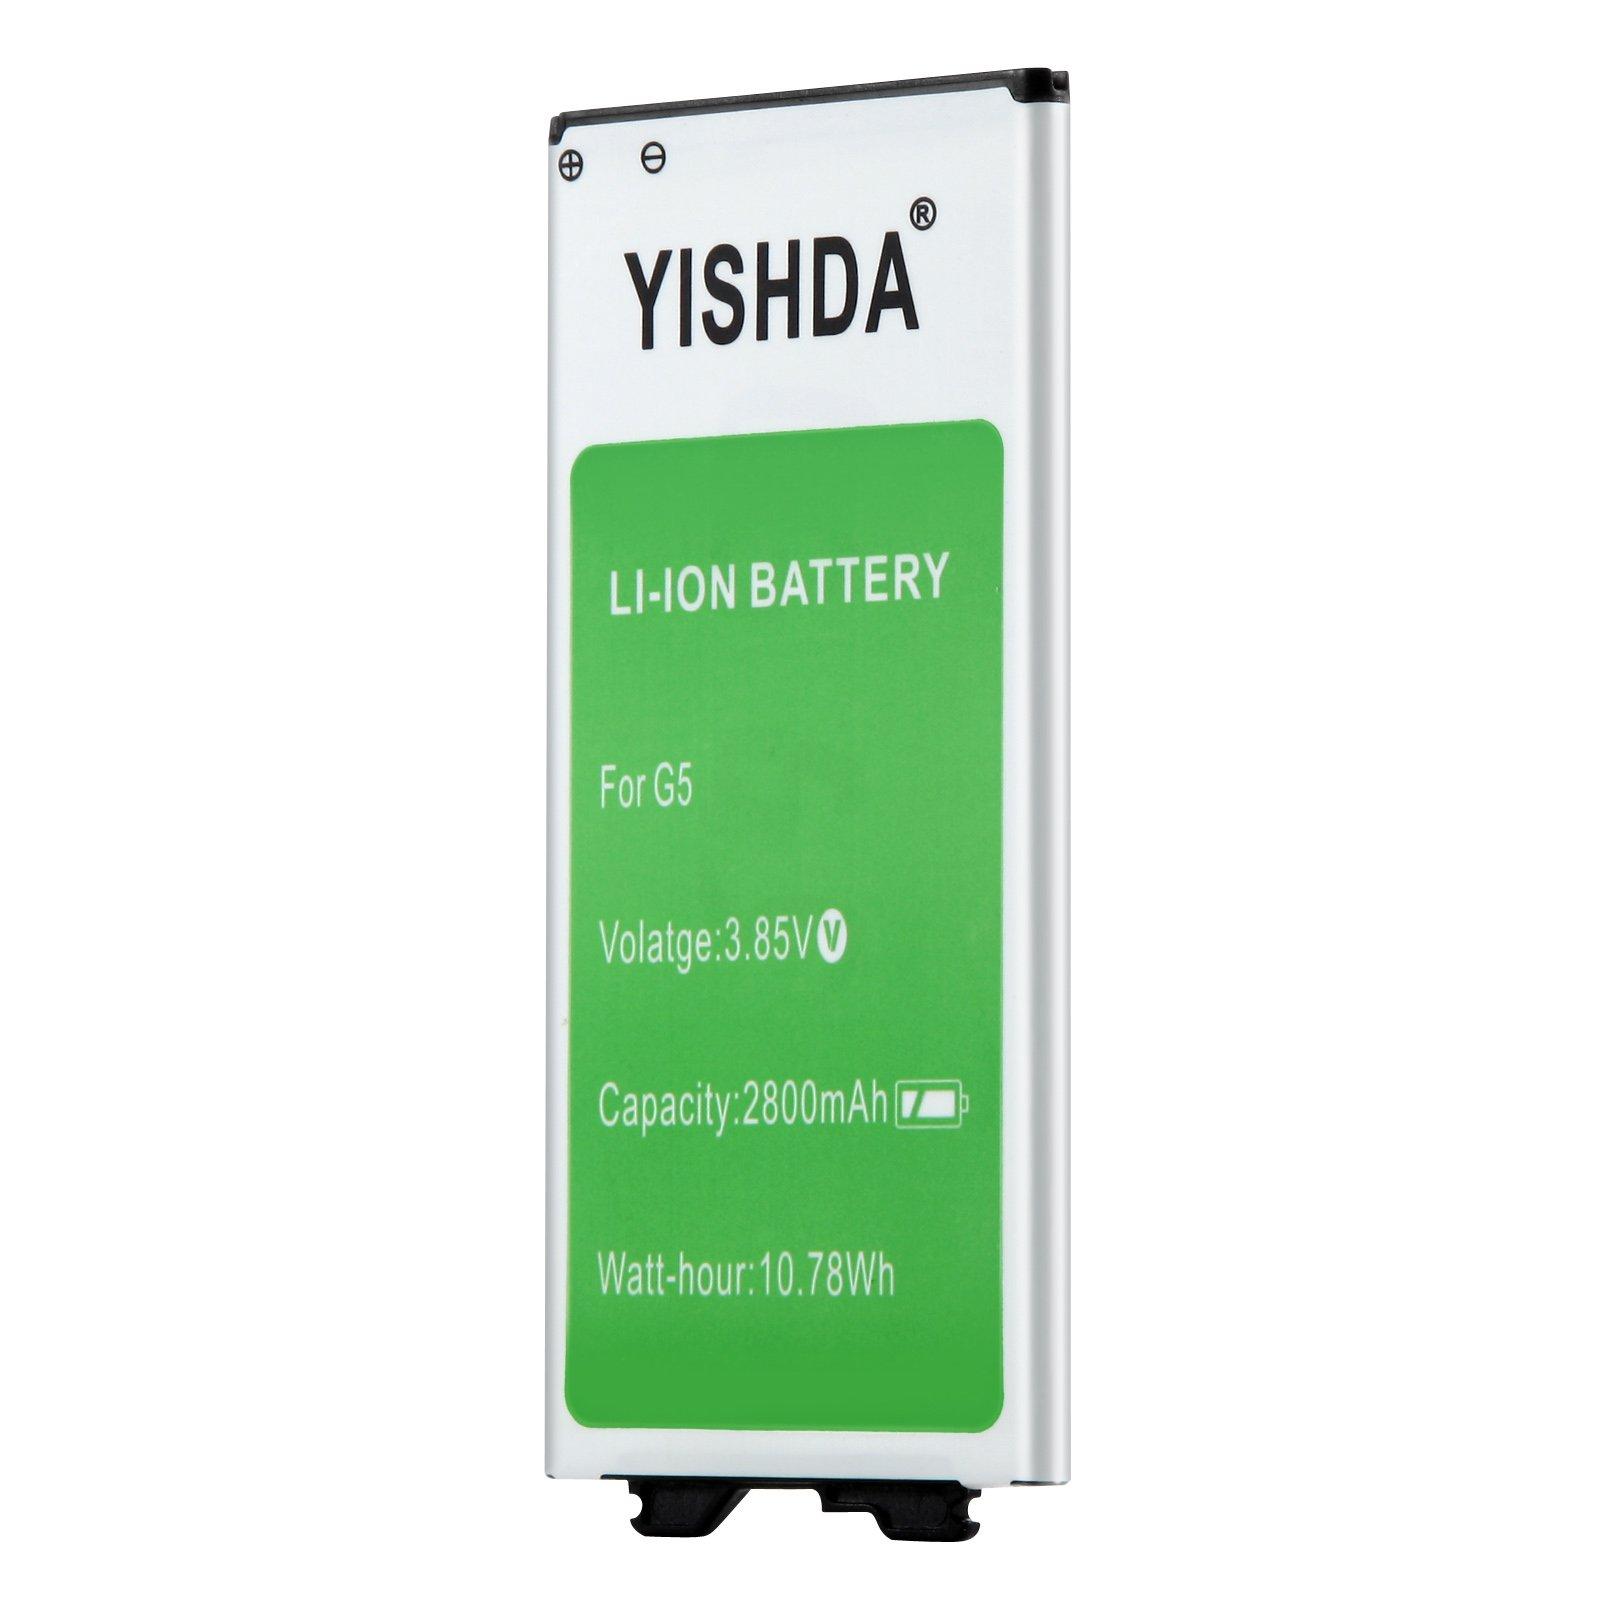 YISHDA LG G5 Battery | 2800mAh Replacement LG BL-42D1F Battery for LG G5 US992 VS987 H820 H830 LS992 H850 H858 | LG G5 Spare Battery [18 Month Warranty]